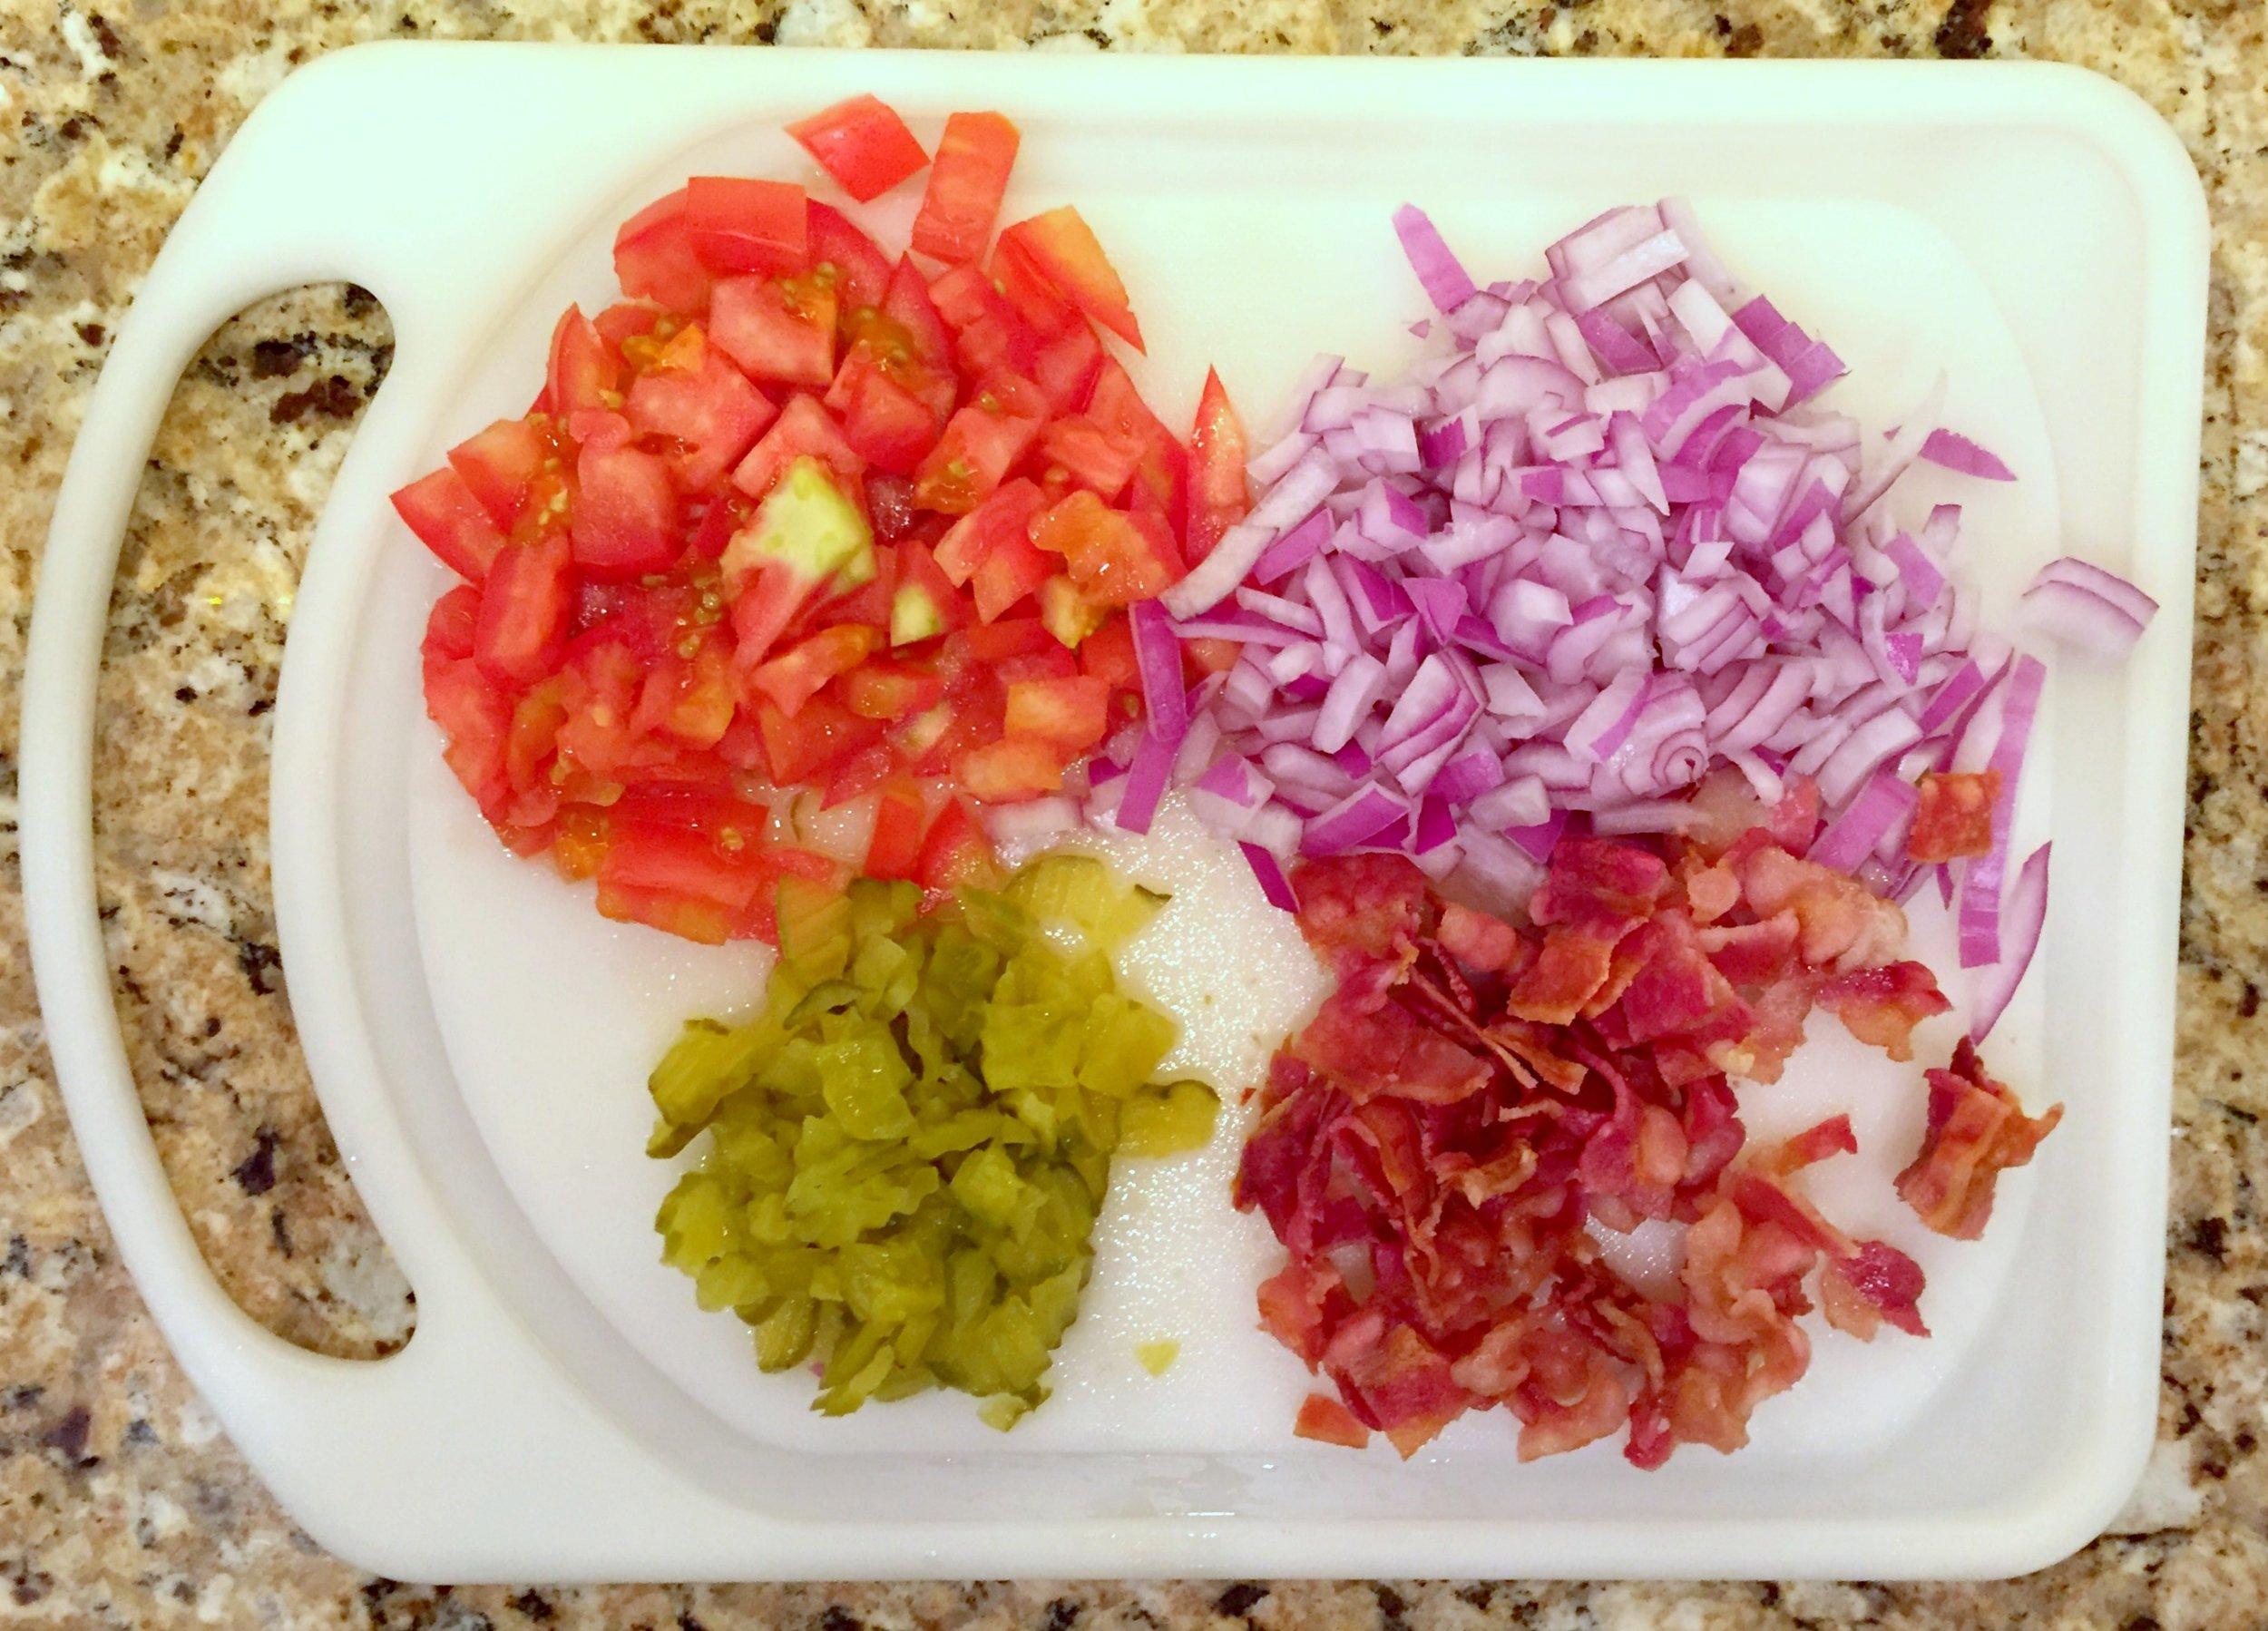 Easy Weeknight Recipe: Burger in a Bowl